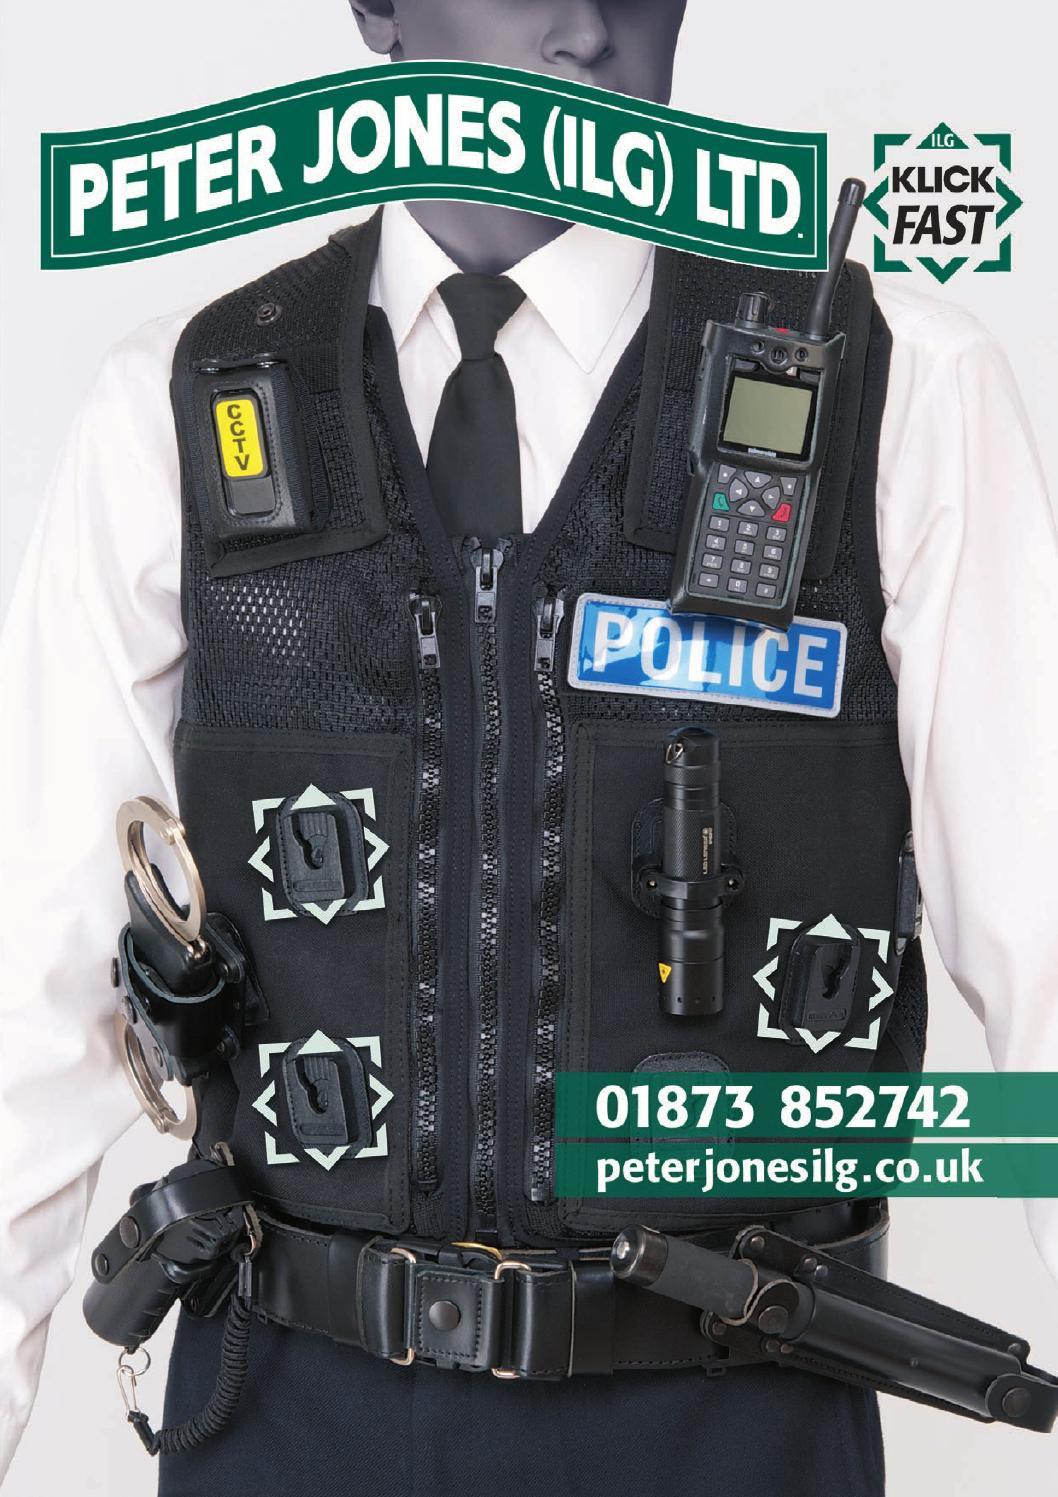 Ex Police Leather Three Position Speedcuff Holder With Press Stud Fastening